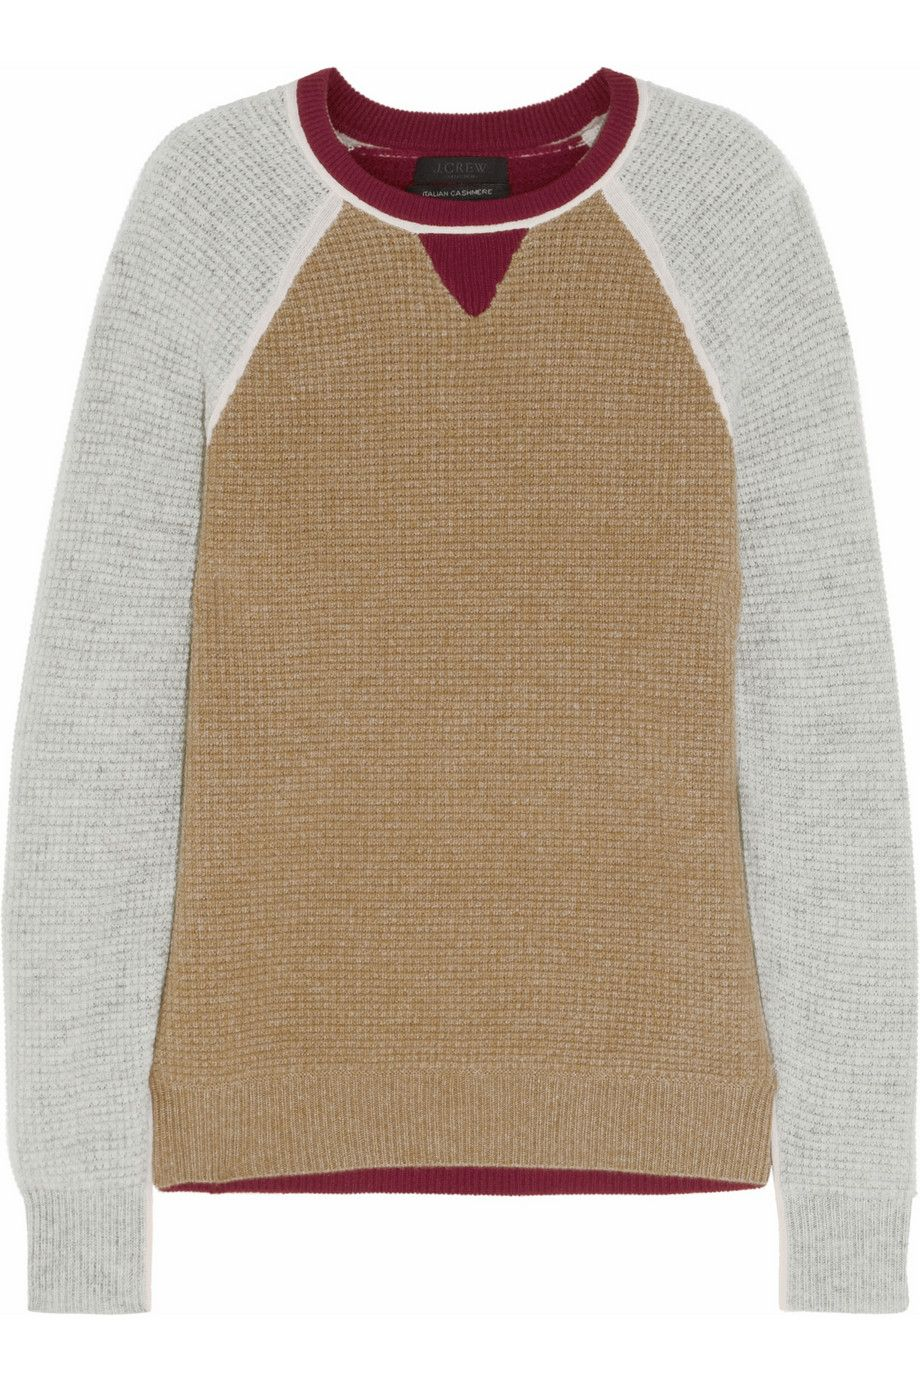 J.Crew | Paxton waffle-knit cashmere sweater | NET-A-PORTER.COM I ...